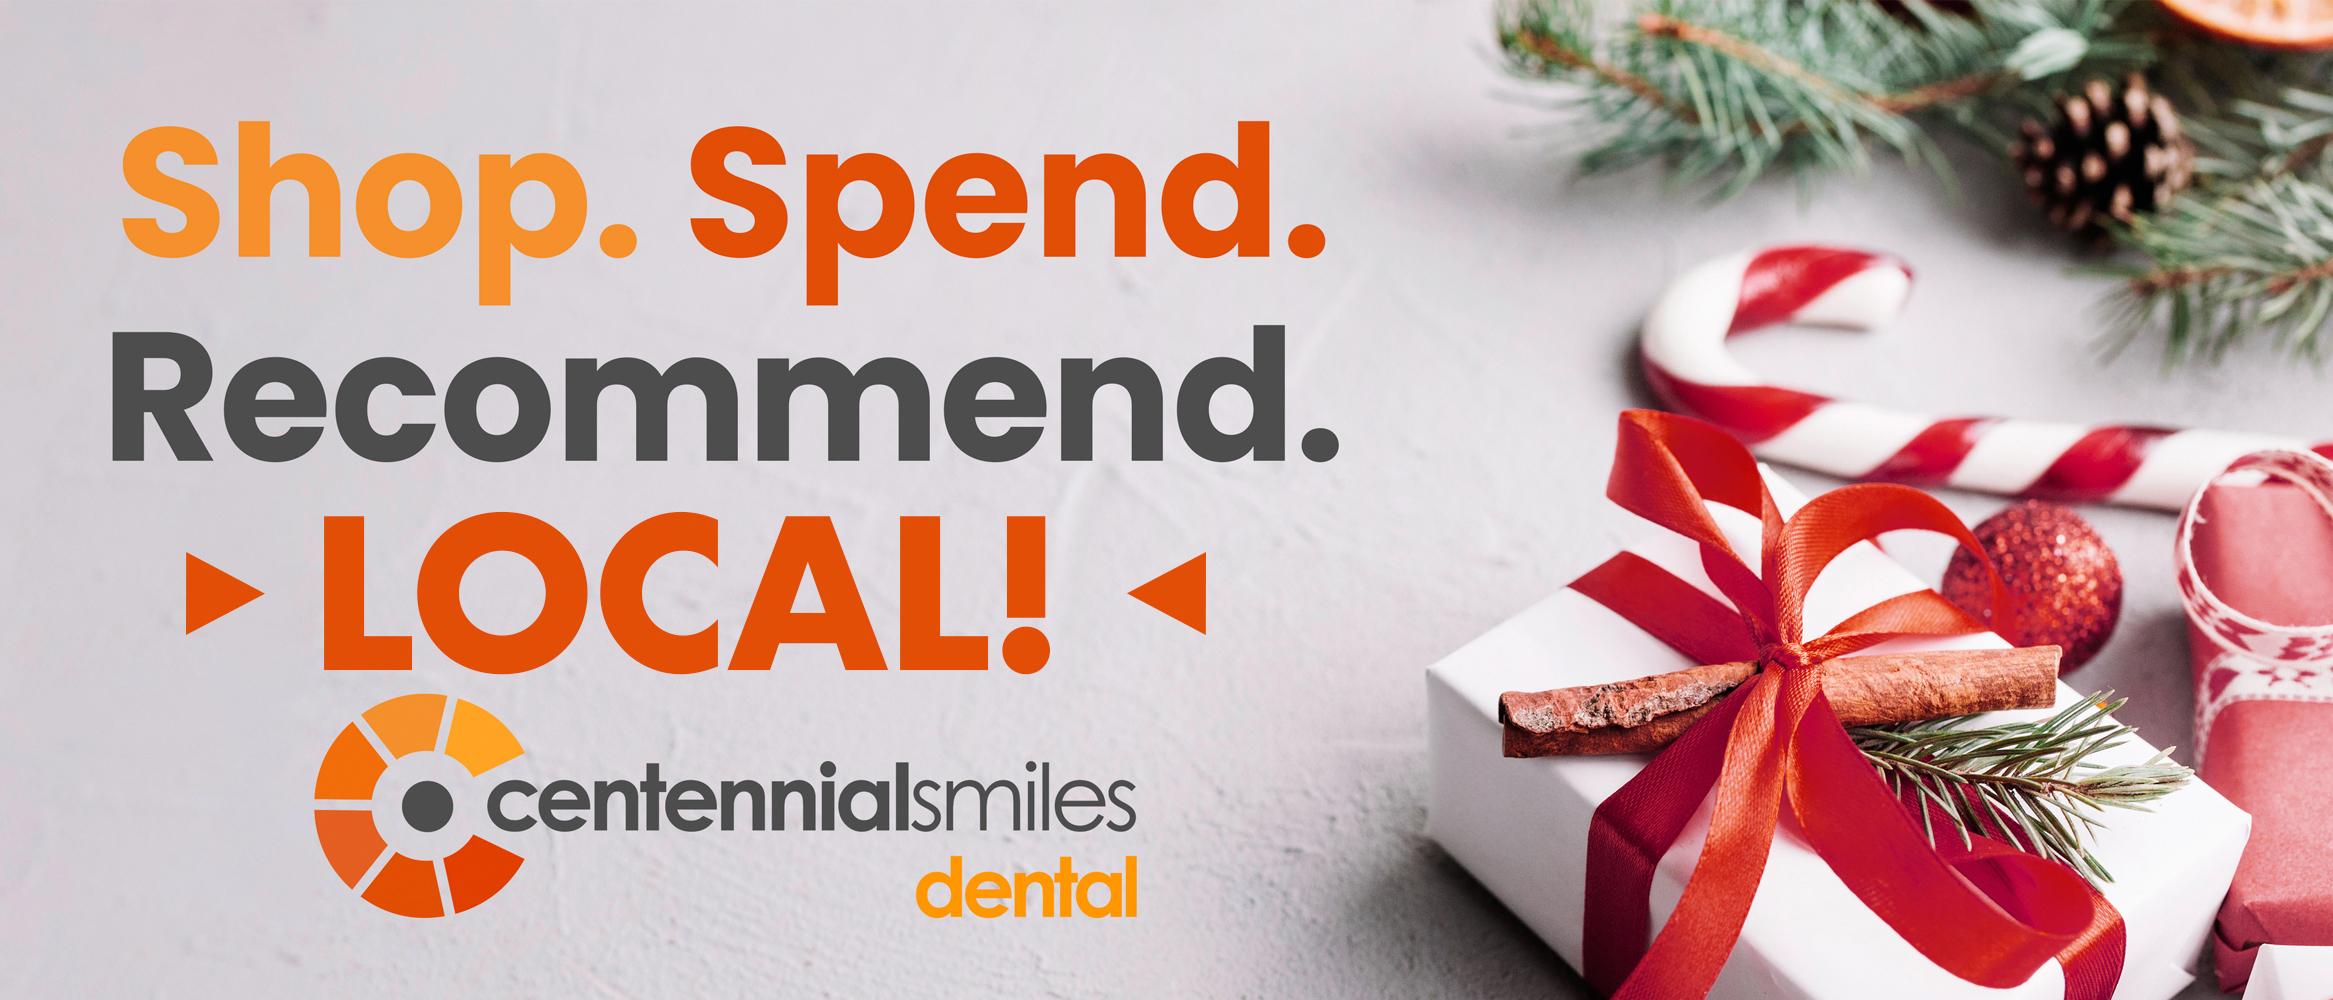 calgary dentist giveaway